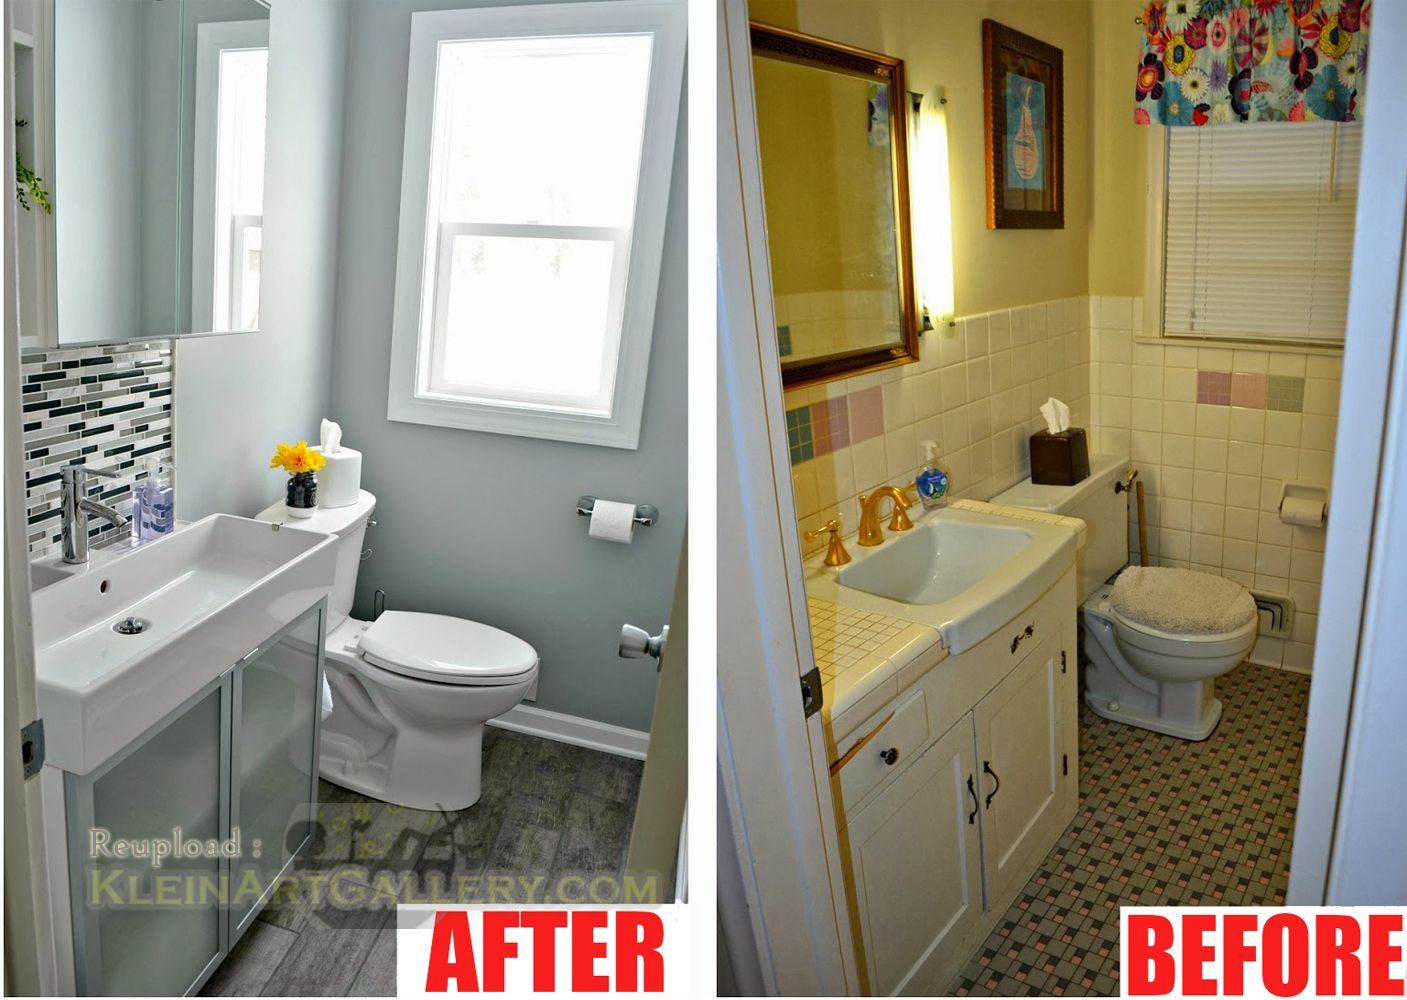 Stylish Remodel Bathroom Small Es Bathroom Design Ideas Remodels Interesting Small Bathrooms Remodel Design Decoration